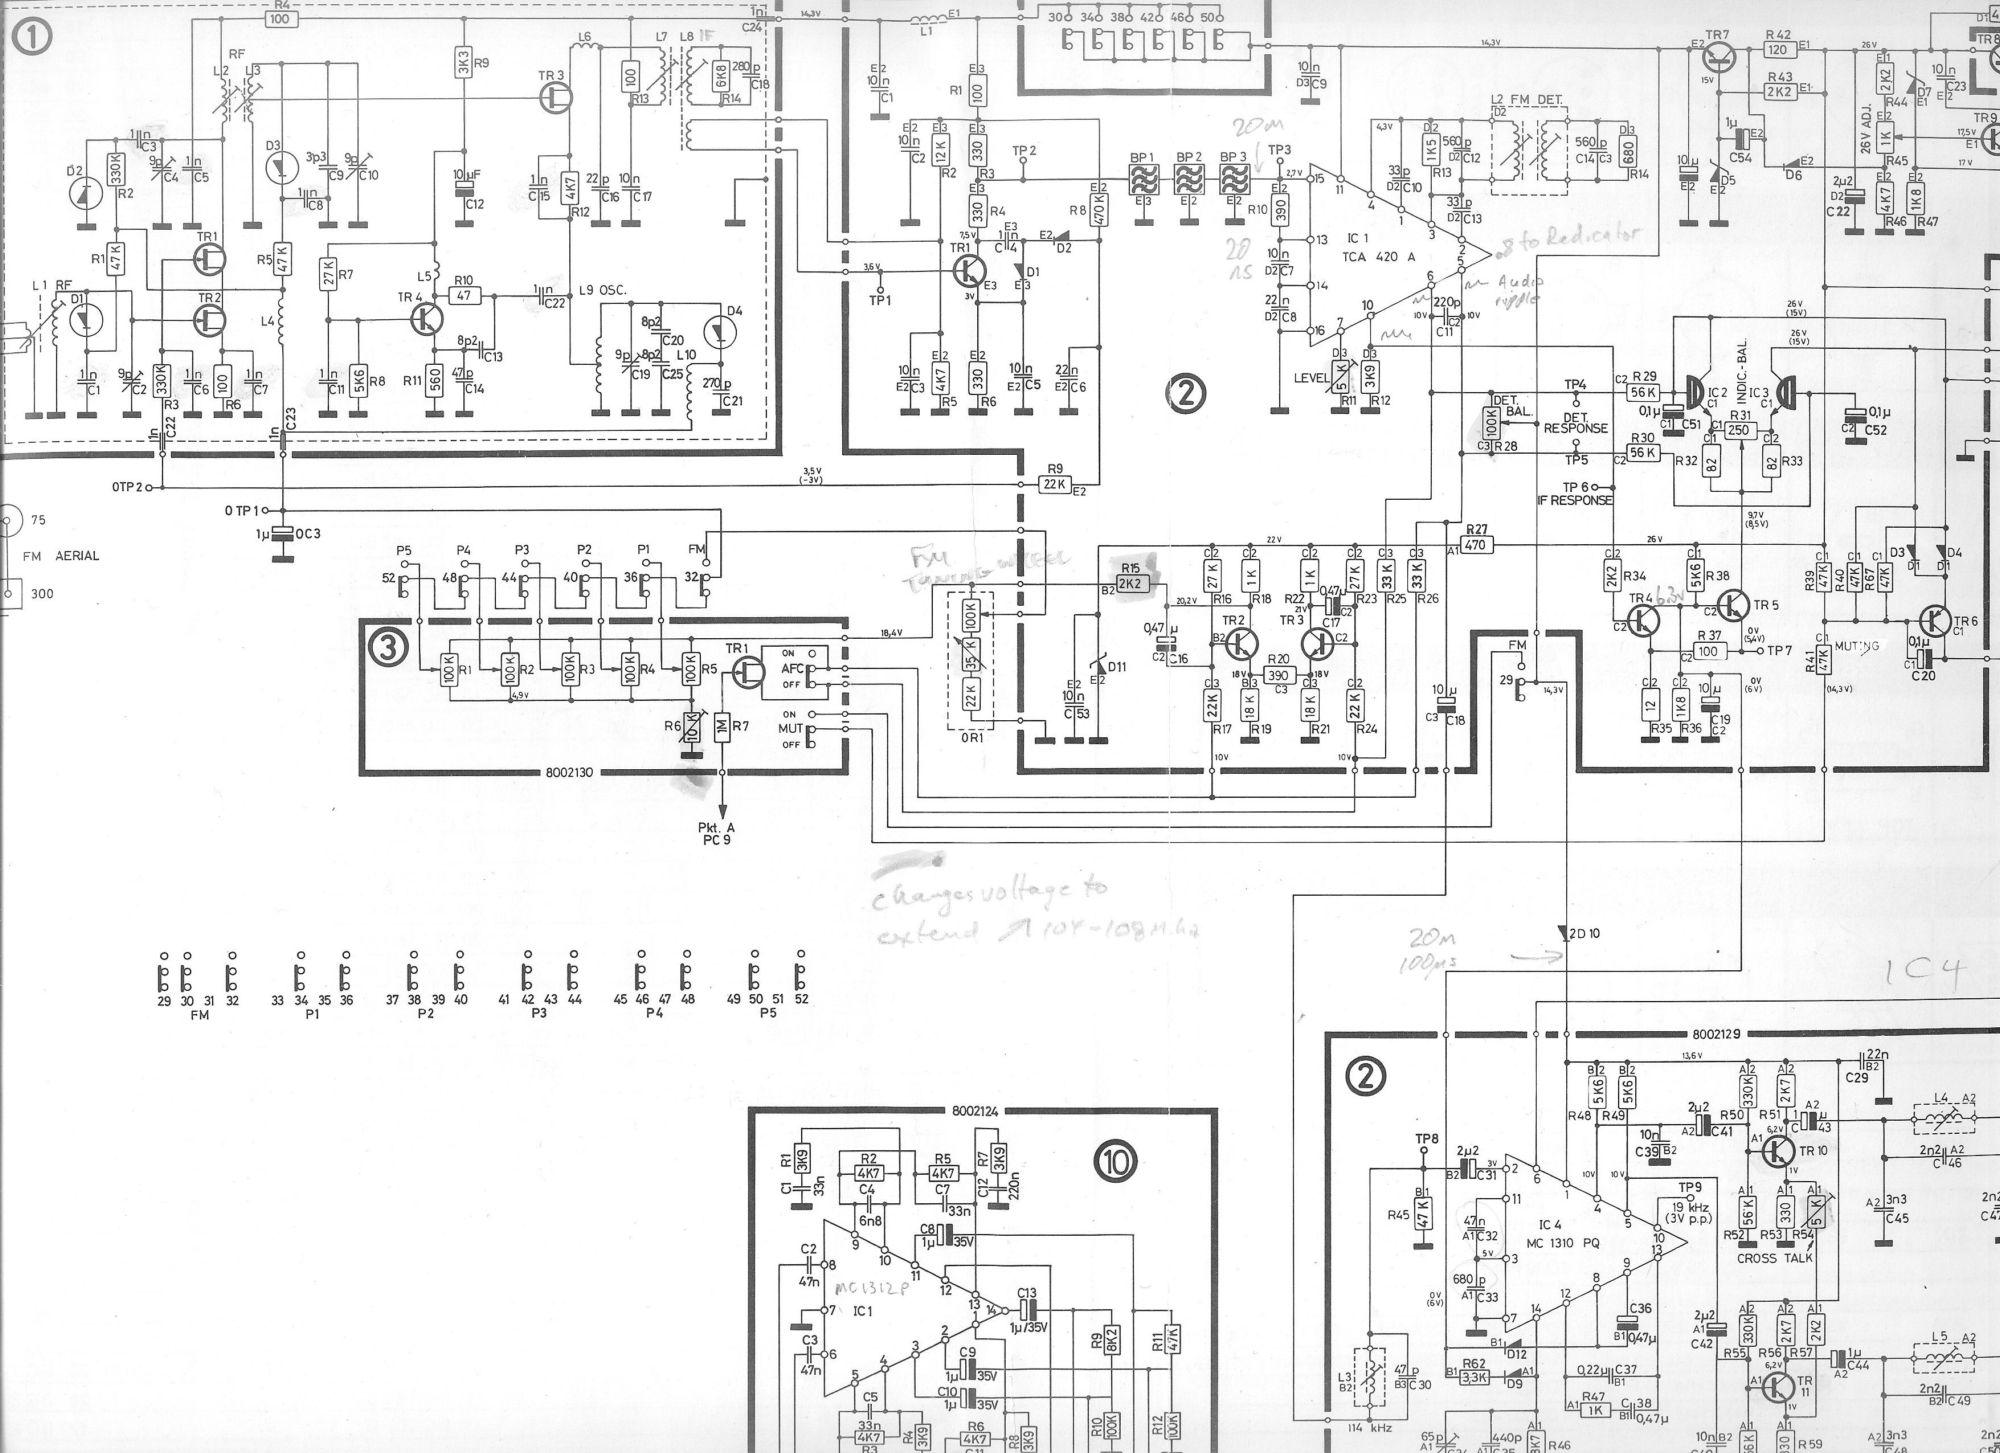 tv tuner card circuit diagram land rover 90 wiring vacuum tube valve page 2 audio circuits next gr